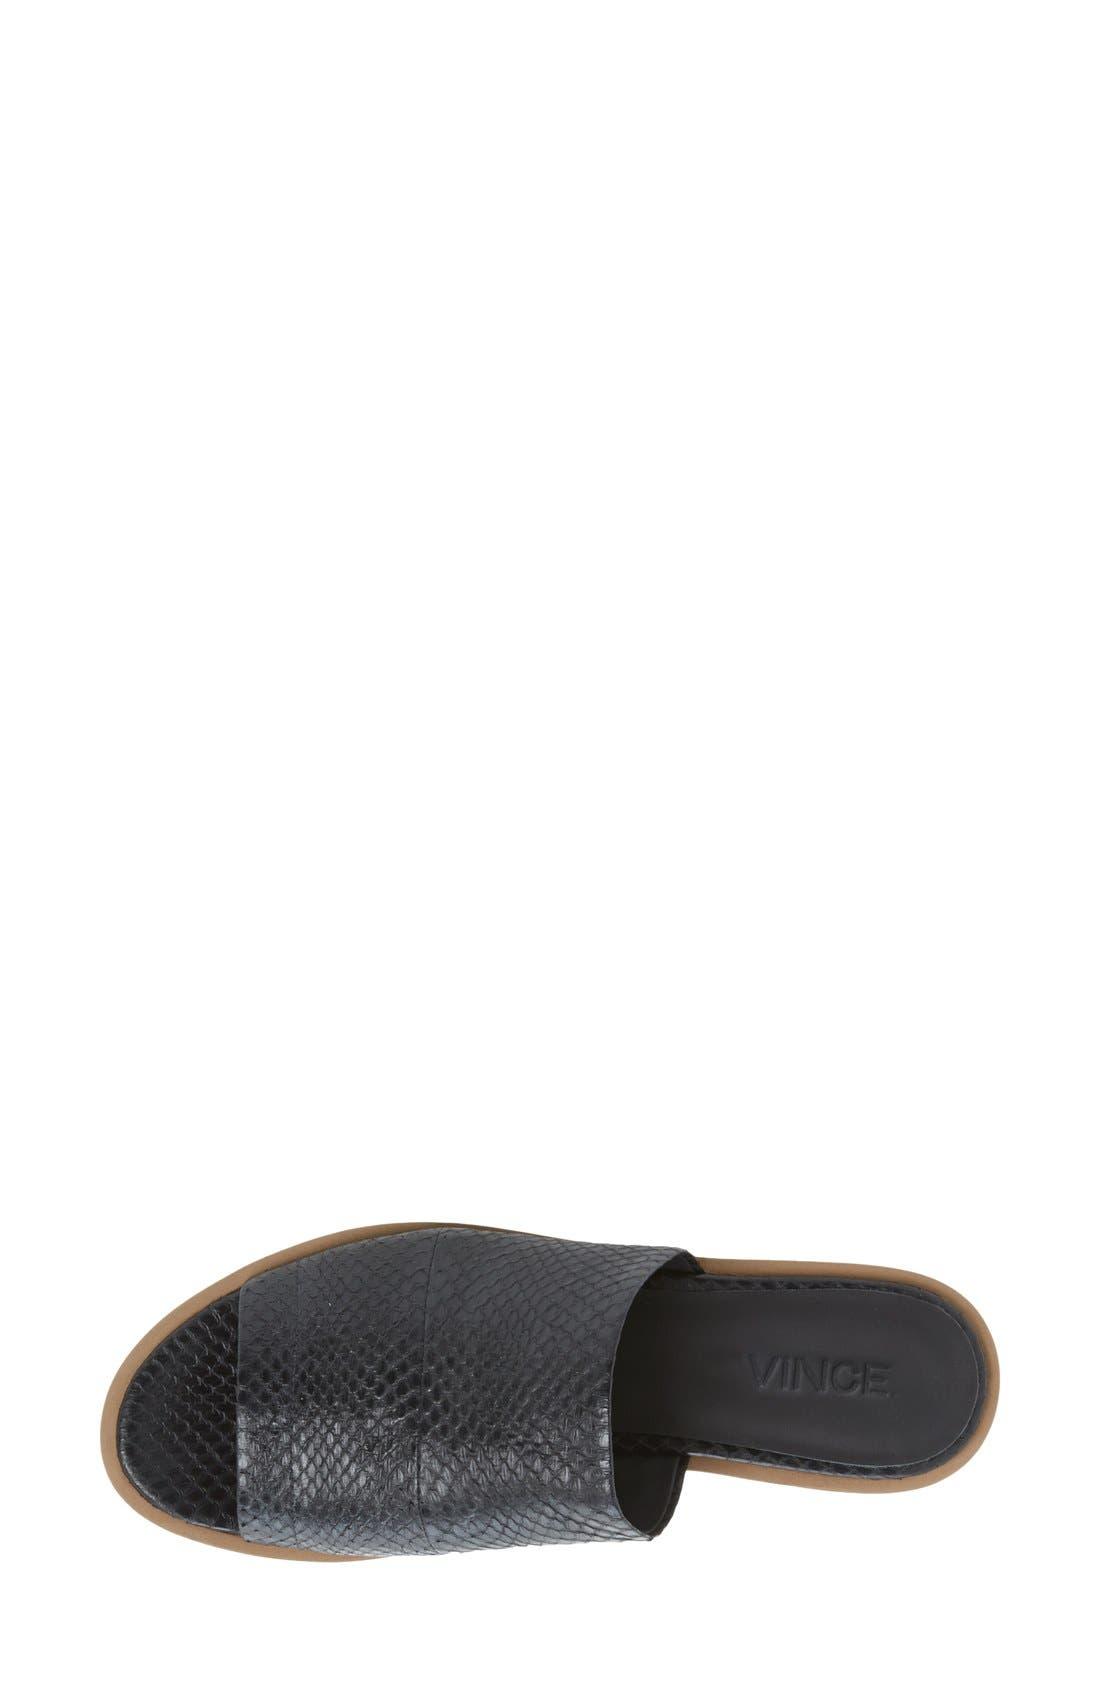 Alternate Image 3  - Vince 'Saskia 2' Platform Sandal (Women)